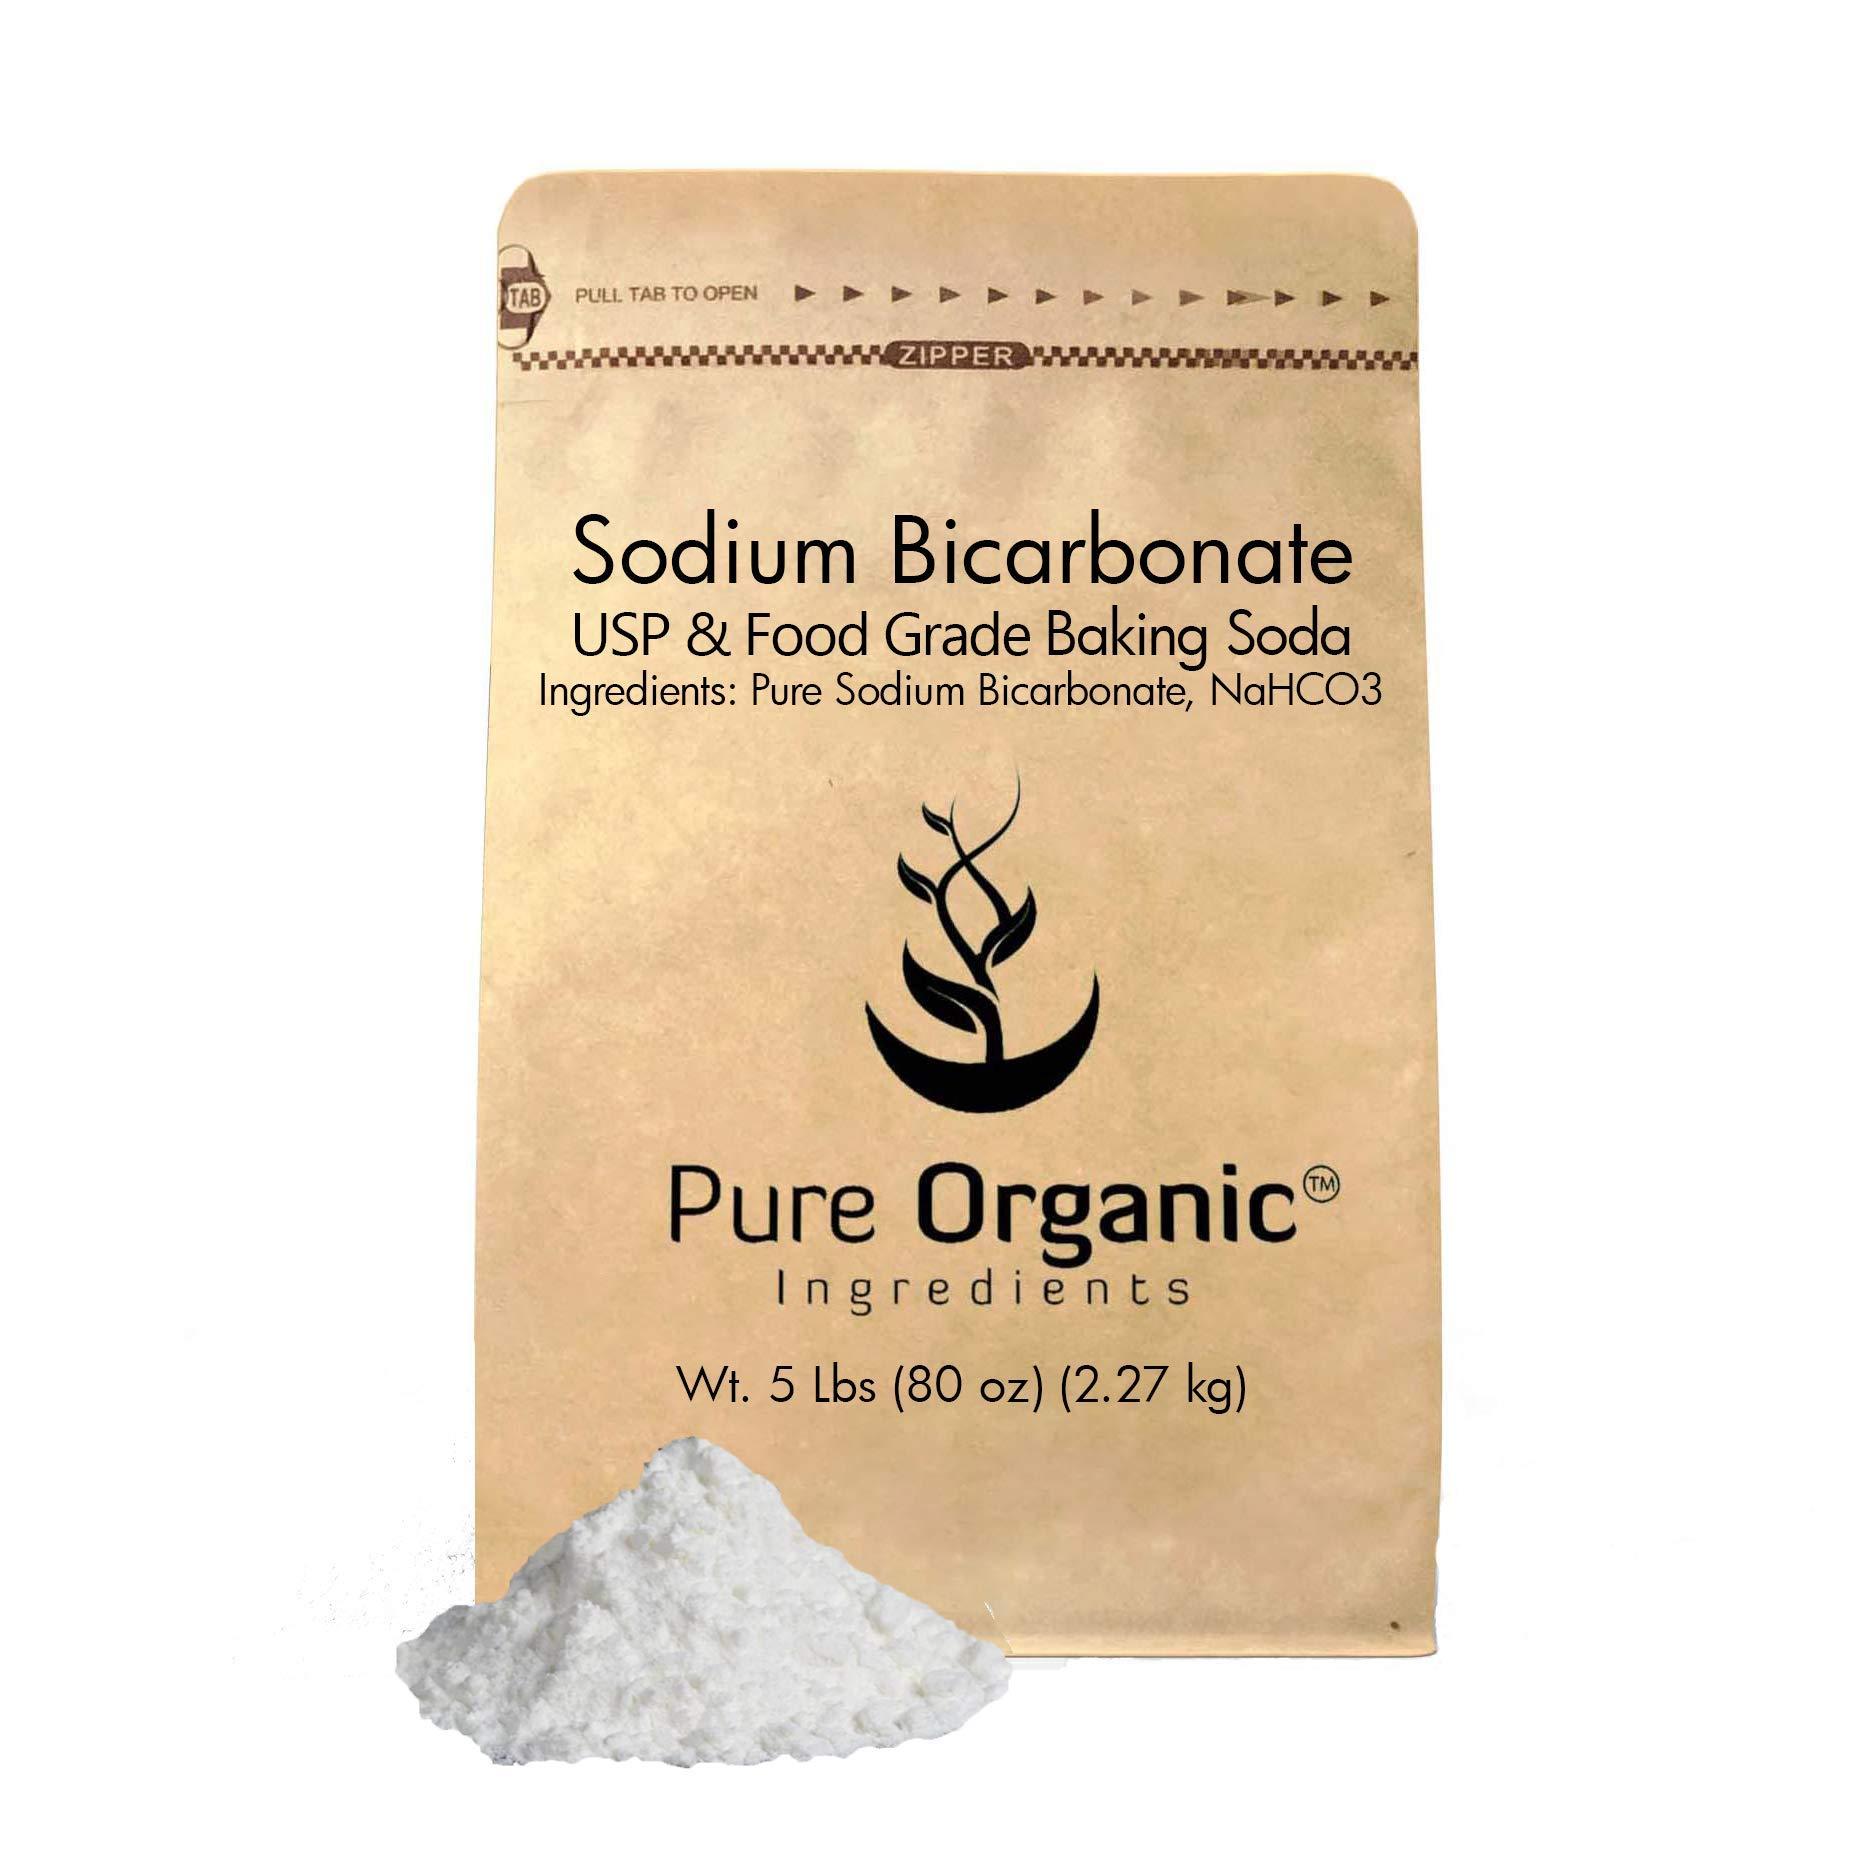 Pure Organic Ingredients Sodium Bicarbonate, Baking Soda, 5 lb, Highest Purity, Food Grade, Eco-Friendly Packaging